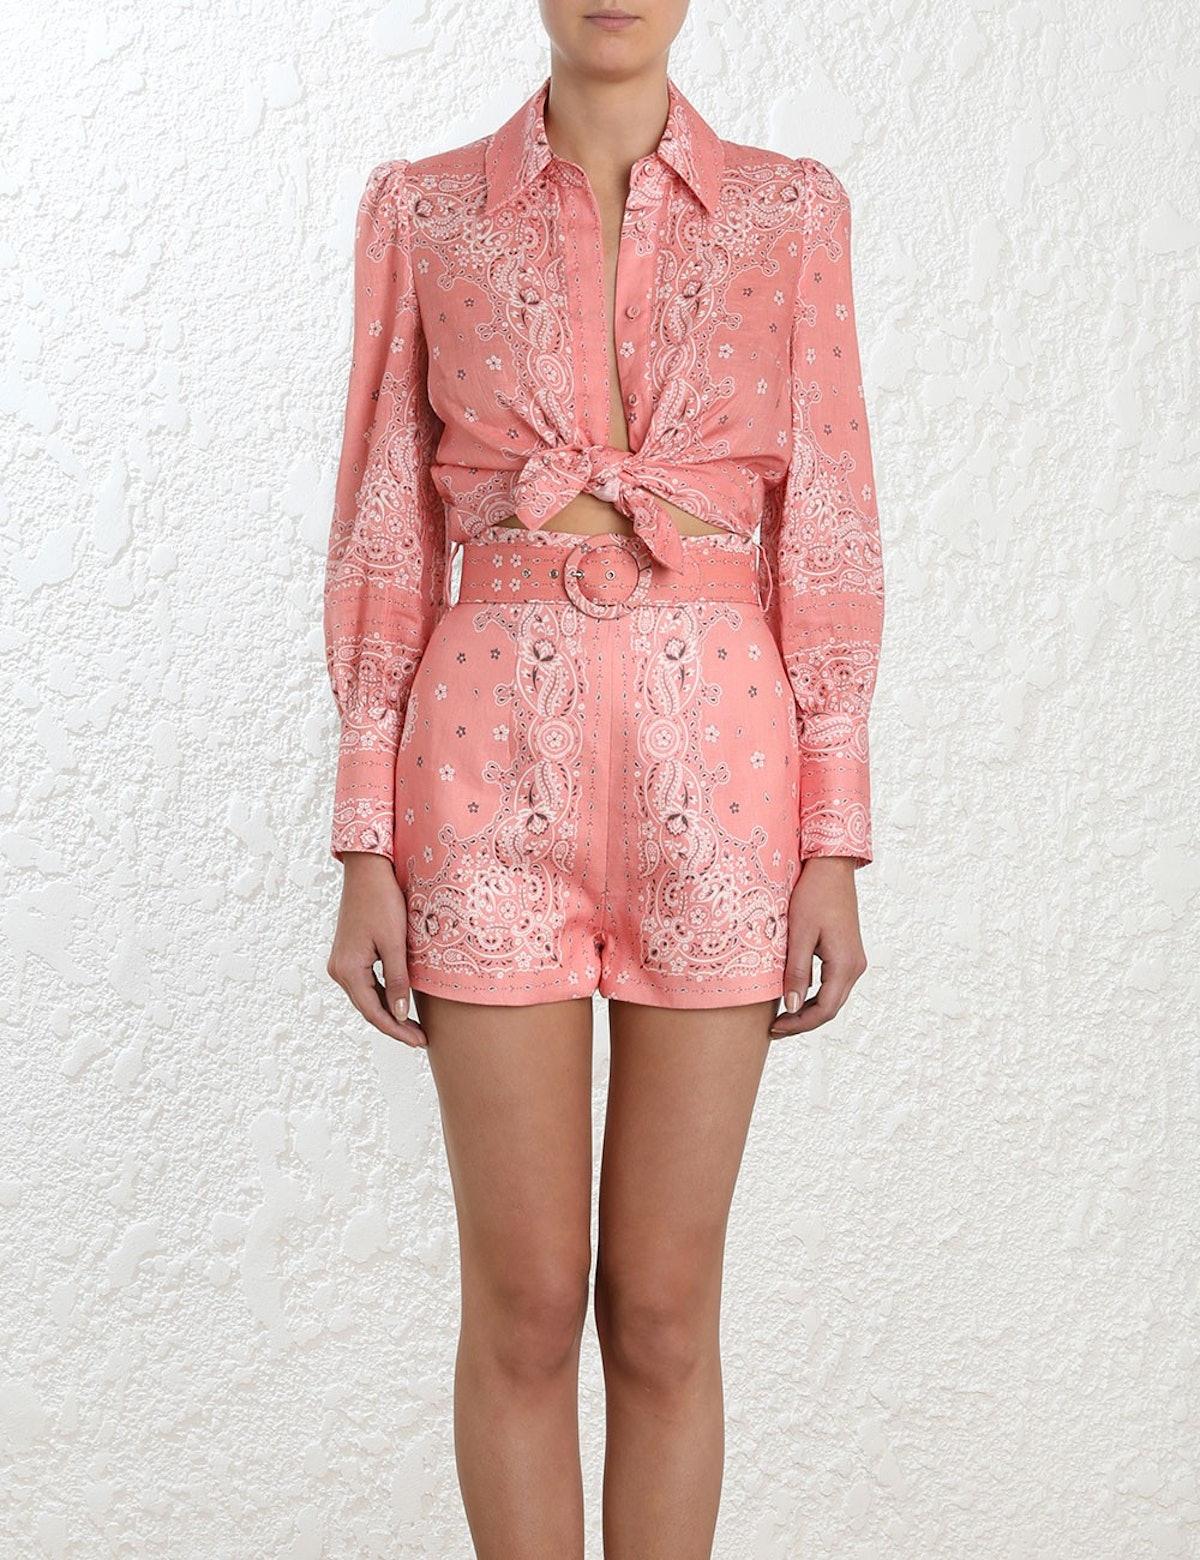 Heathers Bandana Shirt and Shorts